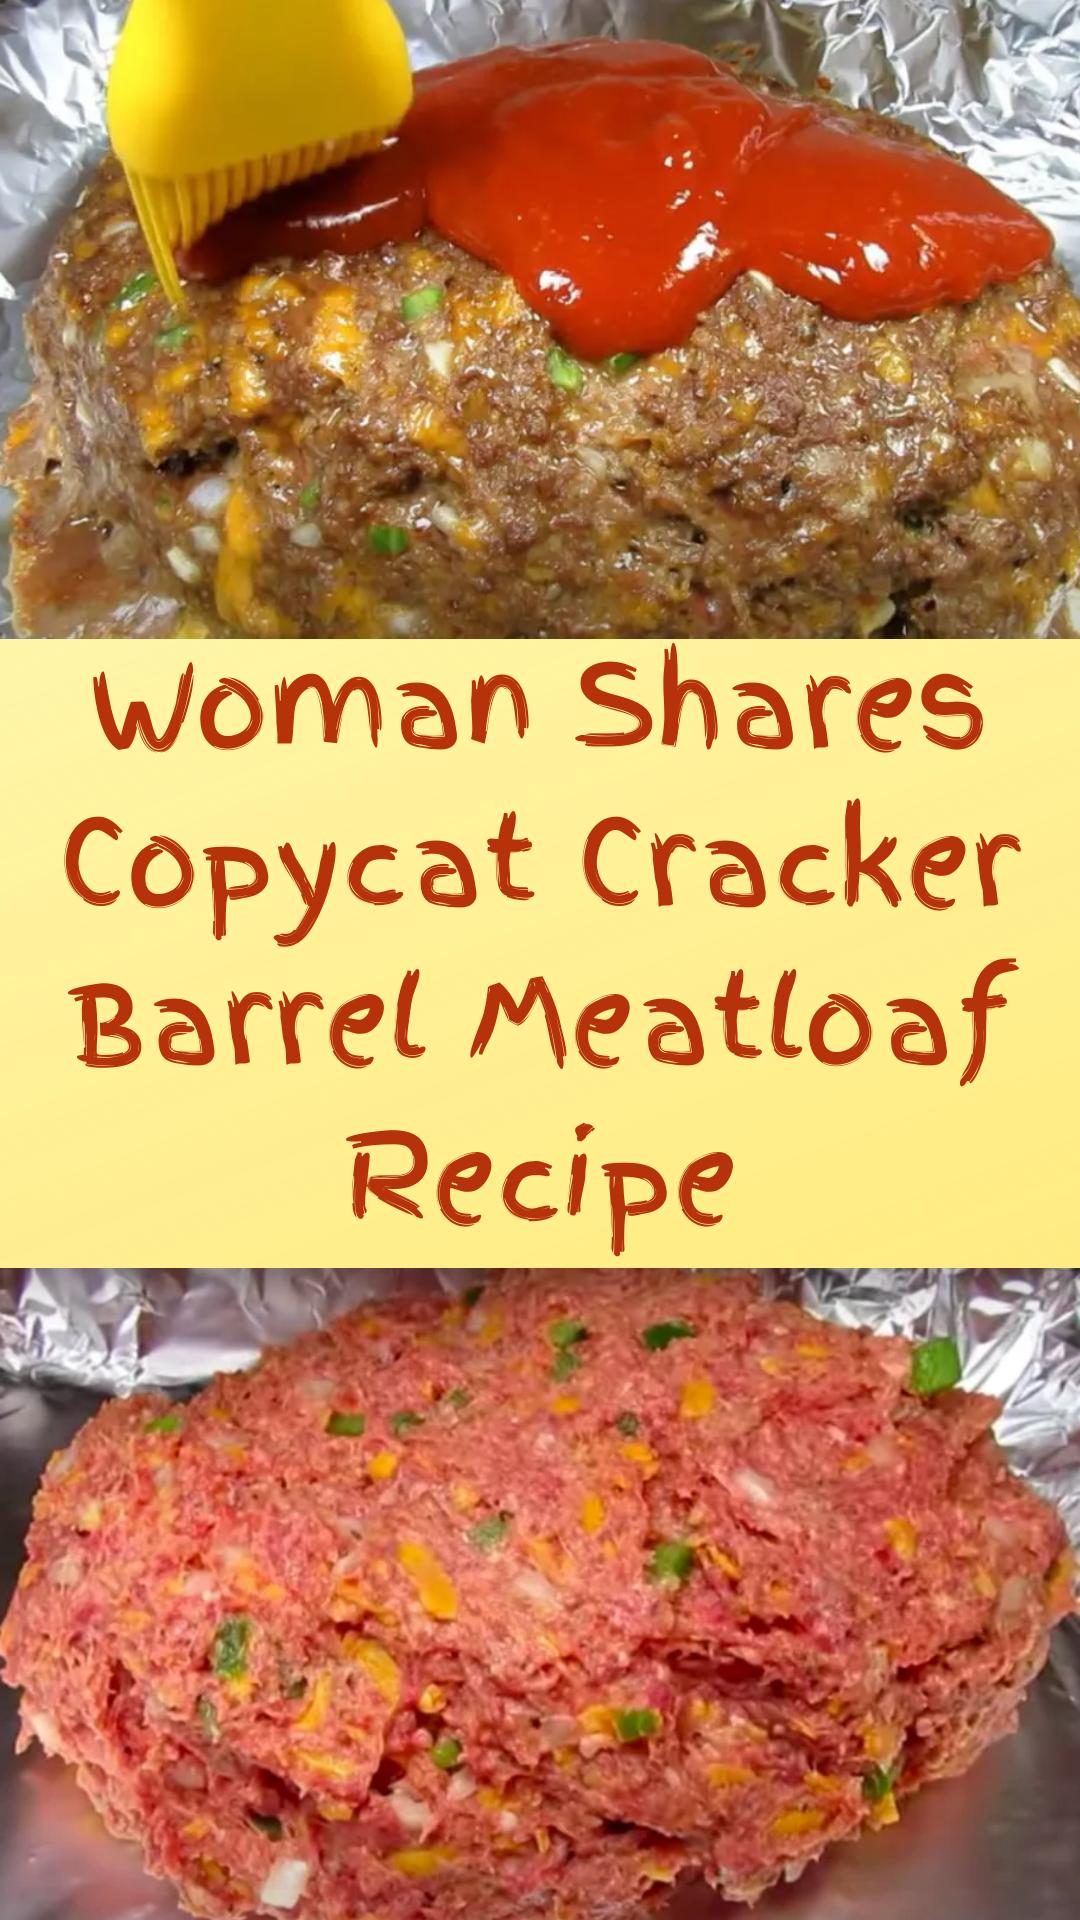 Woman Shares Delicious Copycat Cracker Barrel Meatloaf Recipe In 2021 Recipes Beef Recipes Easy Cooking Recipes